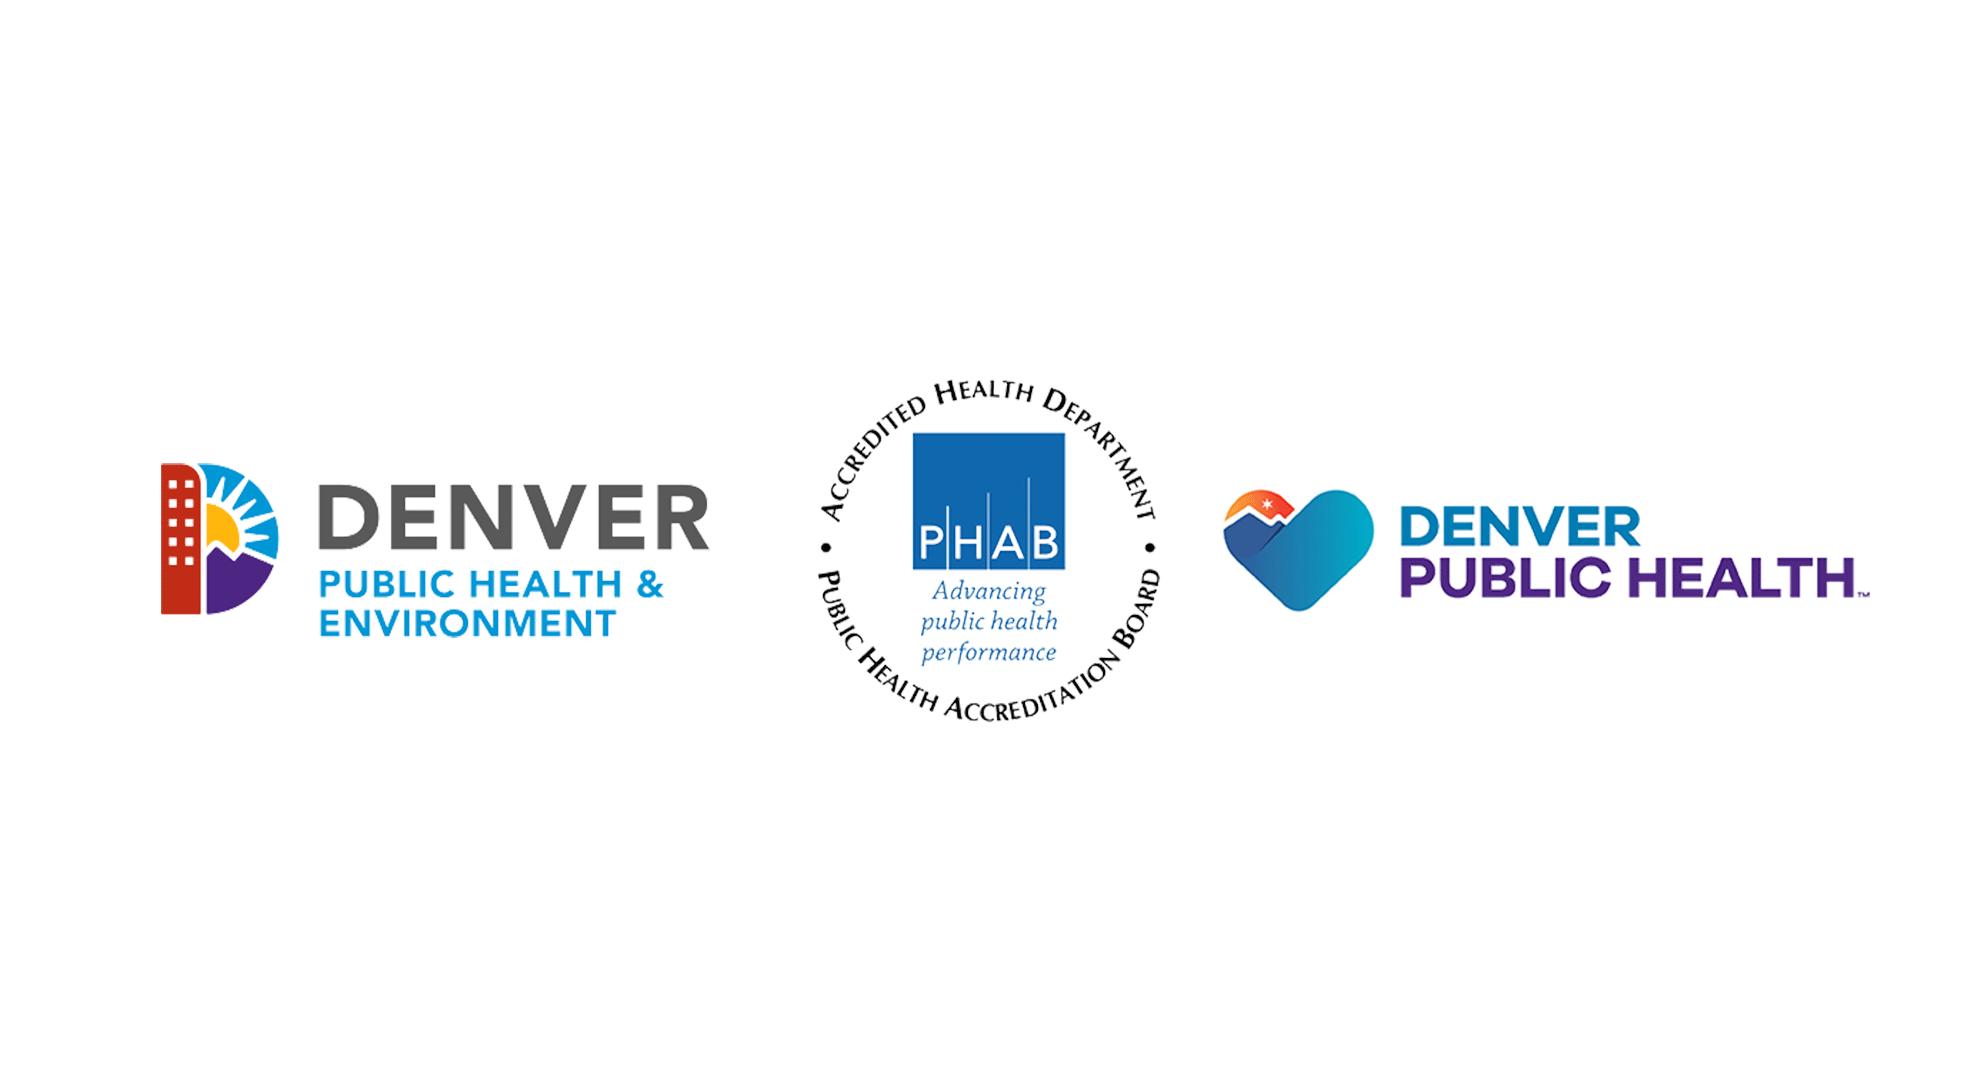 Denver Public Health and DDPHE logos